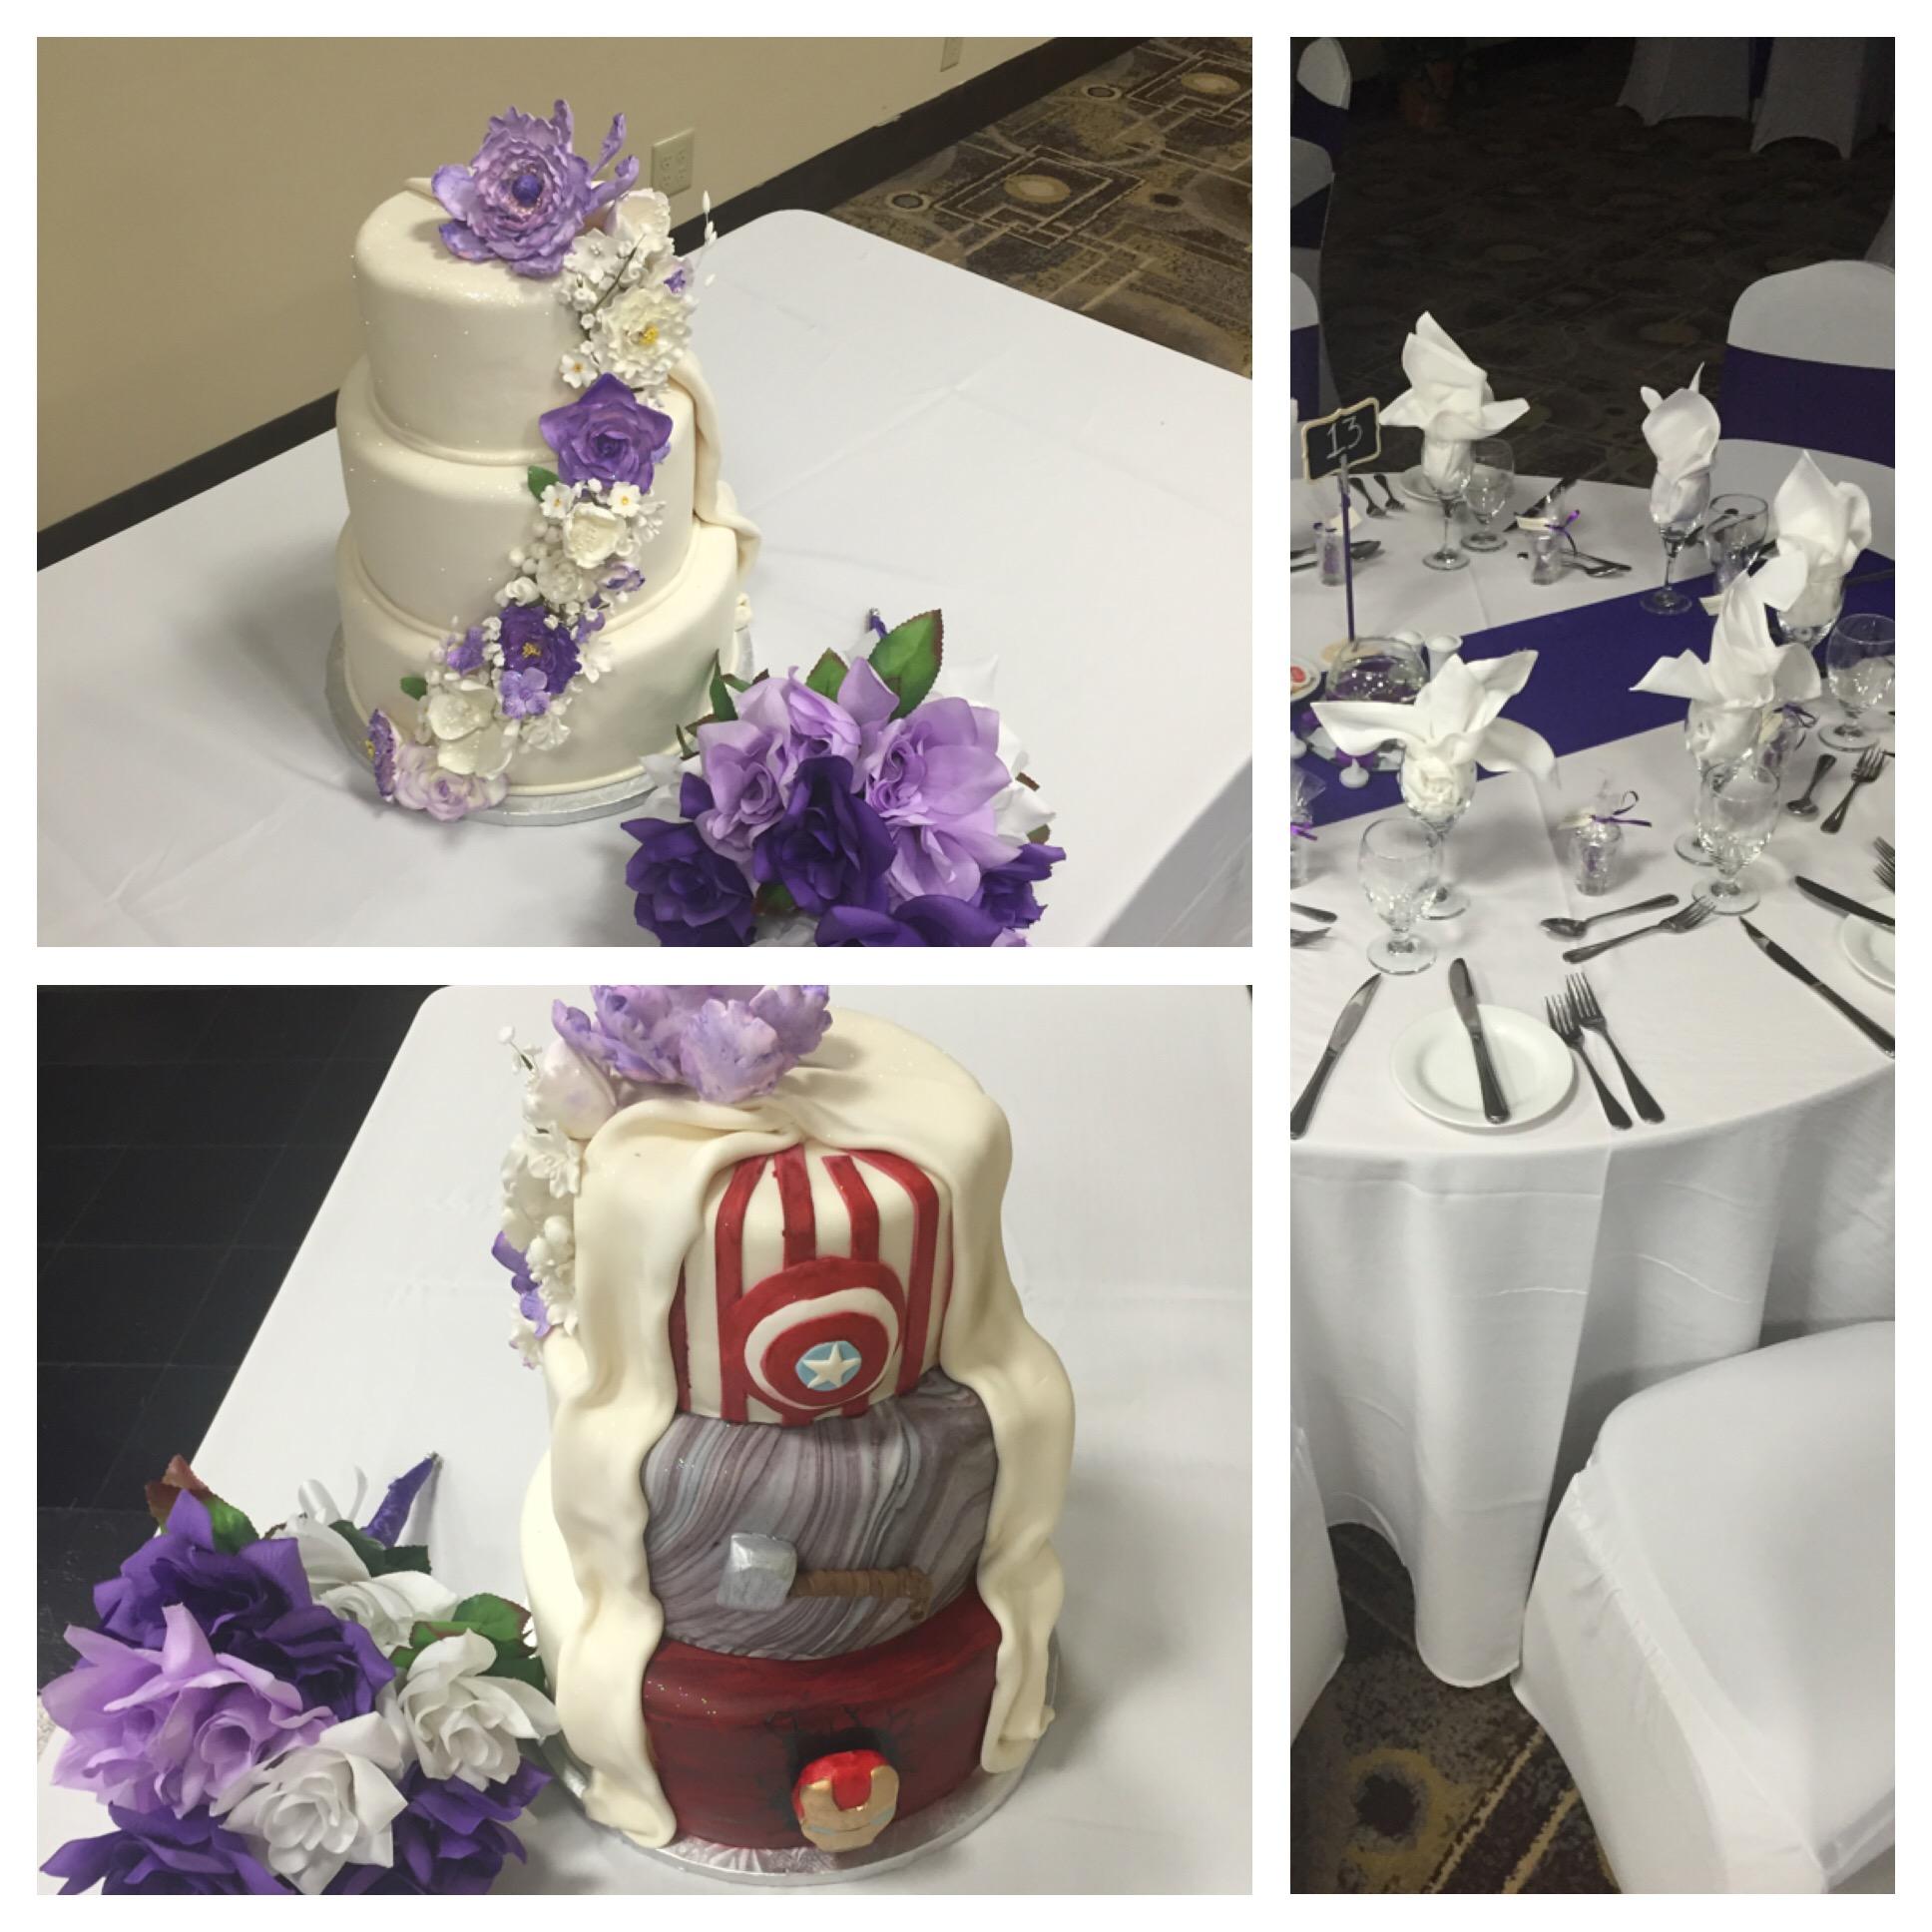 Gallery Gypsyrose Wedding Events Services